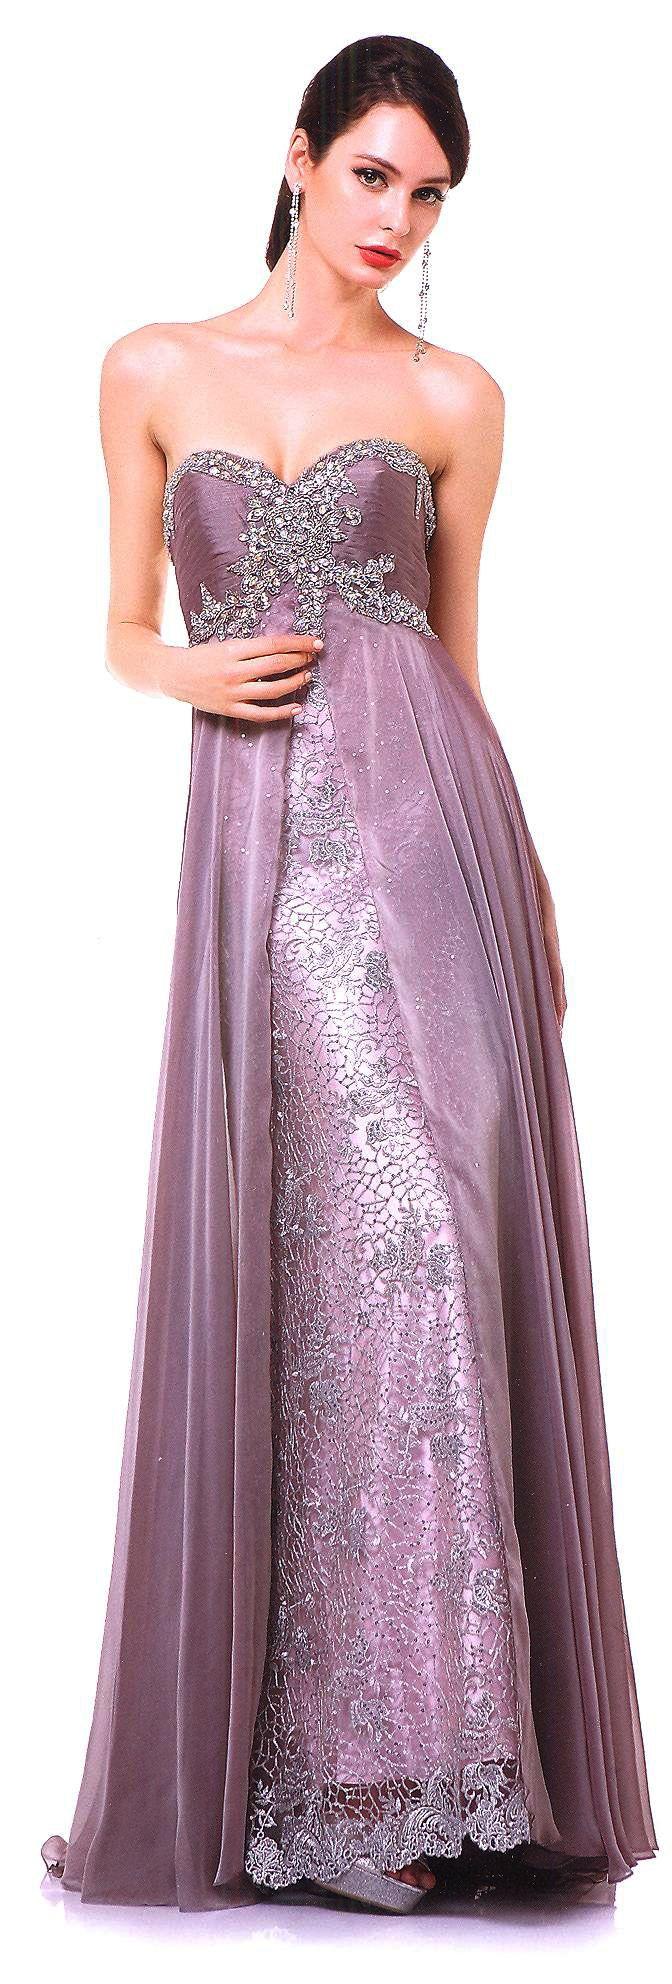 Prom dresses evening dressesucbrueucbruestrapless sweetheart bead